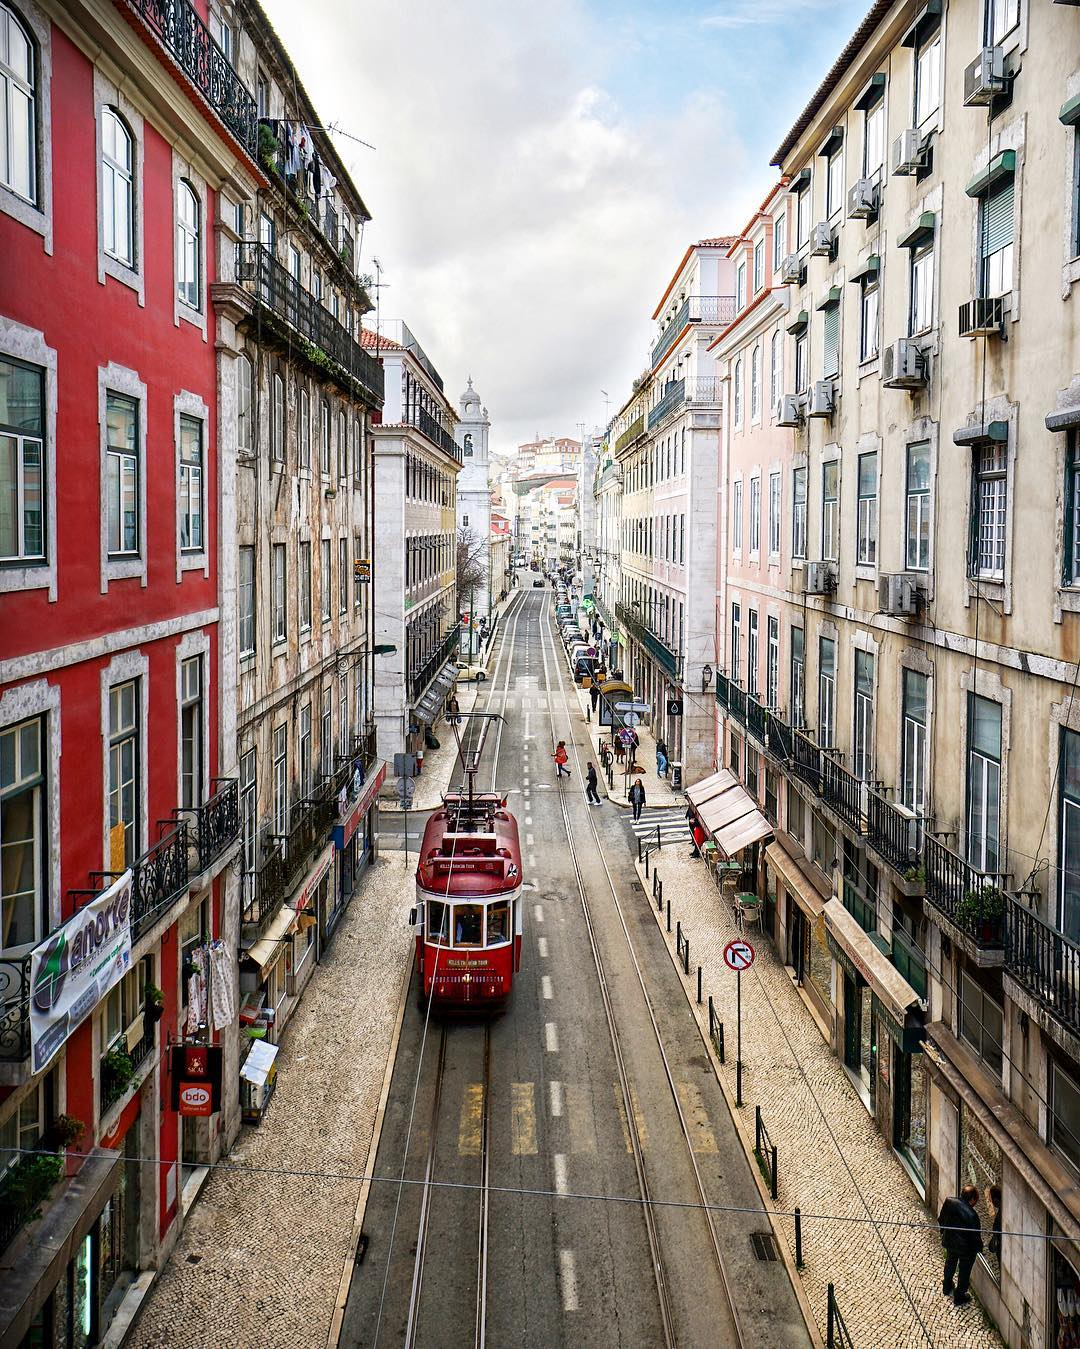 Путешествия и уличные снимки от Алекса Зуахи